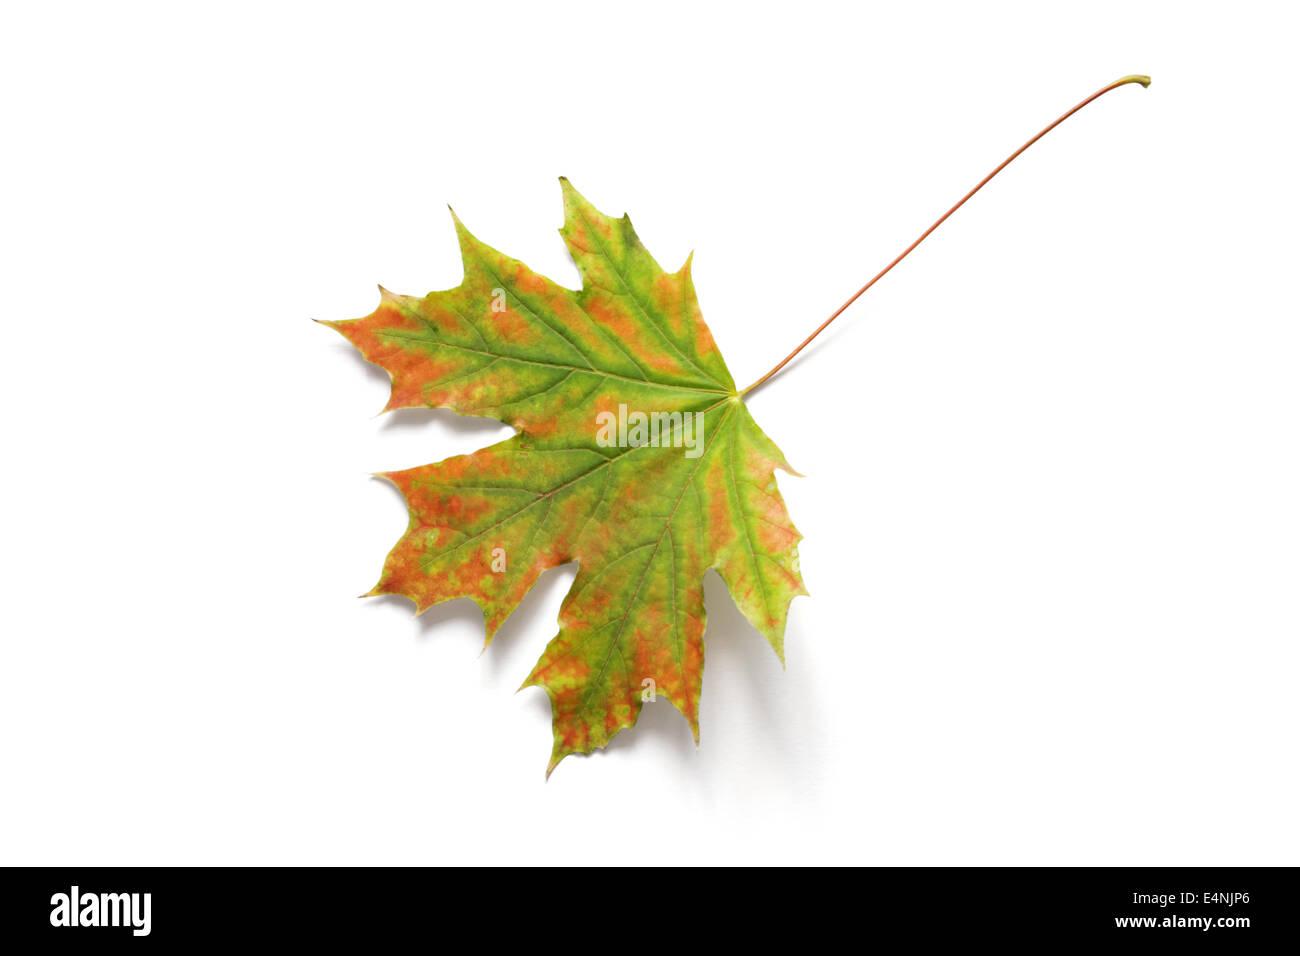 Autumn dry maple leaf - Stock Image